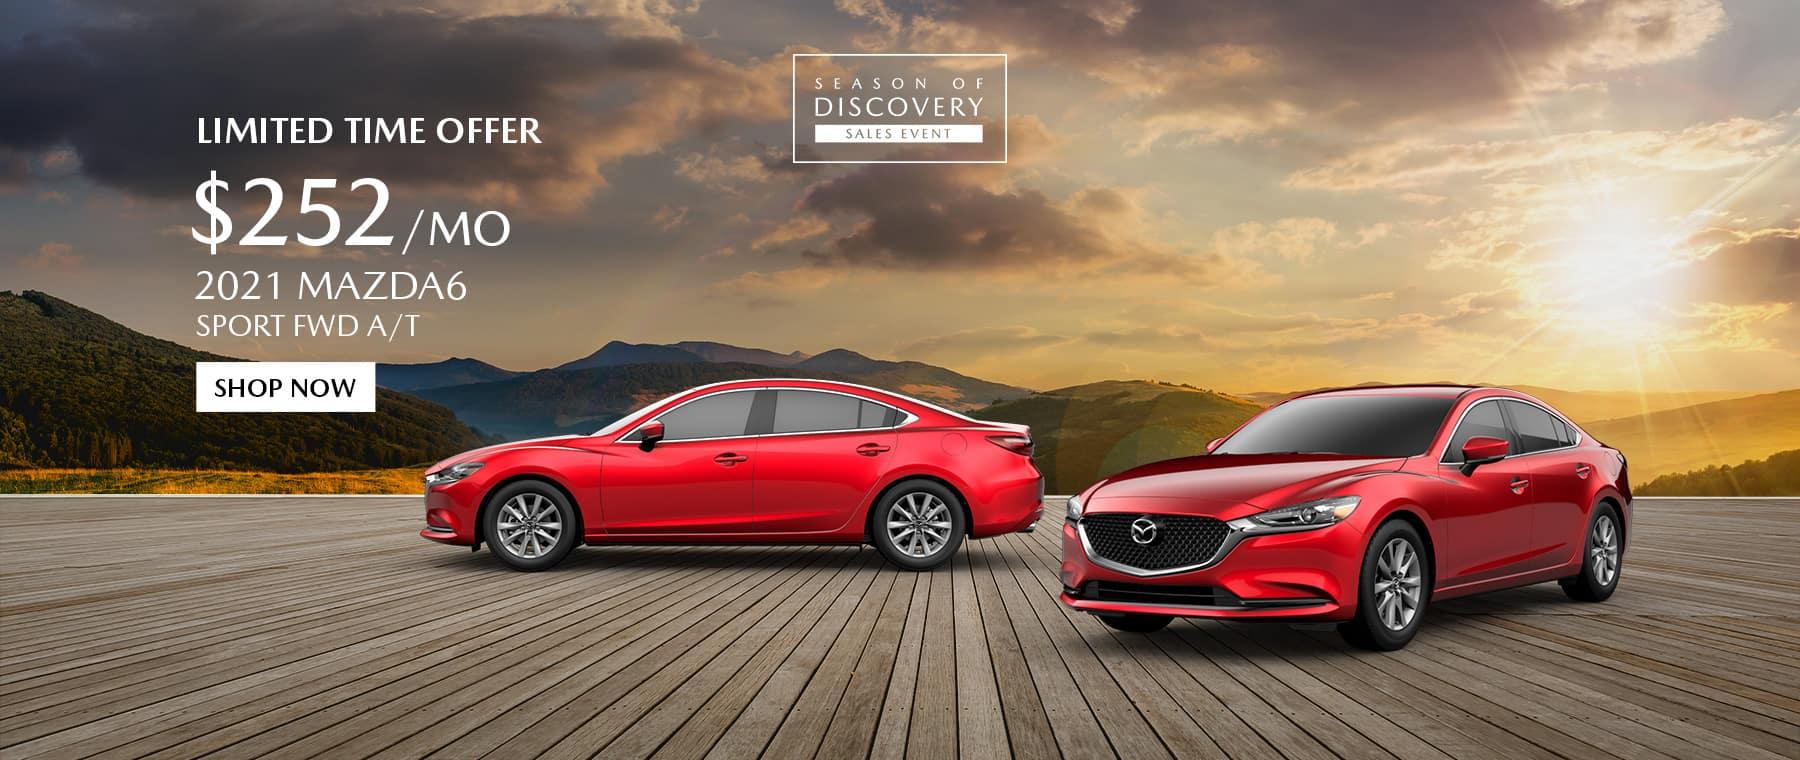 2021 Mazda 6 Special Offer